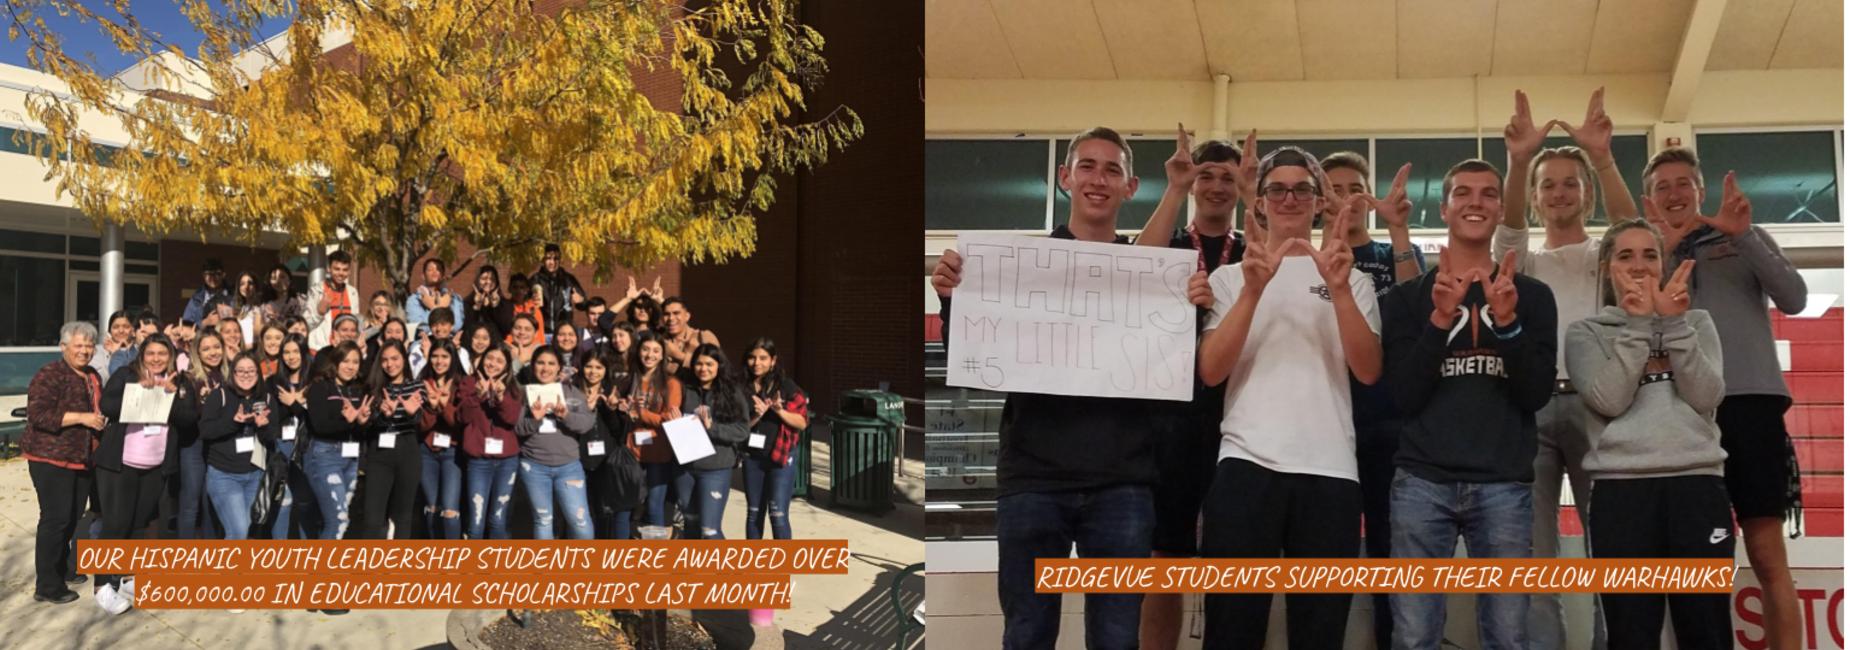 Hispanic  leadership students awarded over 600,000.00 in scholarships. Ridgevue students cheering on their fellow warhawks.